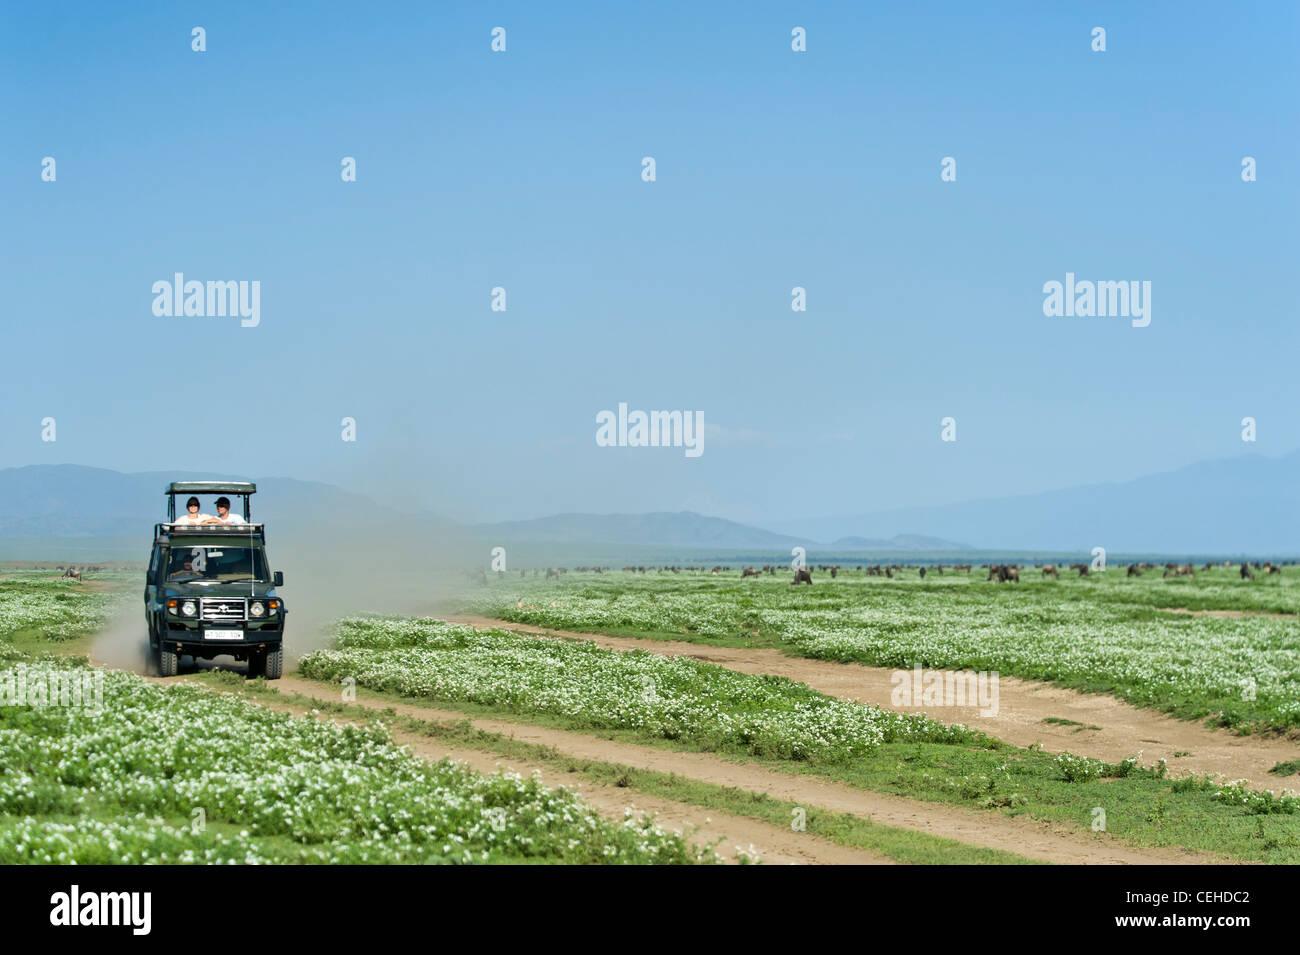 Vorbei die Gnus Migration am Ndutu in Ngorongoro Conservation Area - Tansania Safari-Fahrzeug Stockfoto